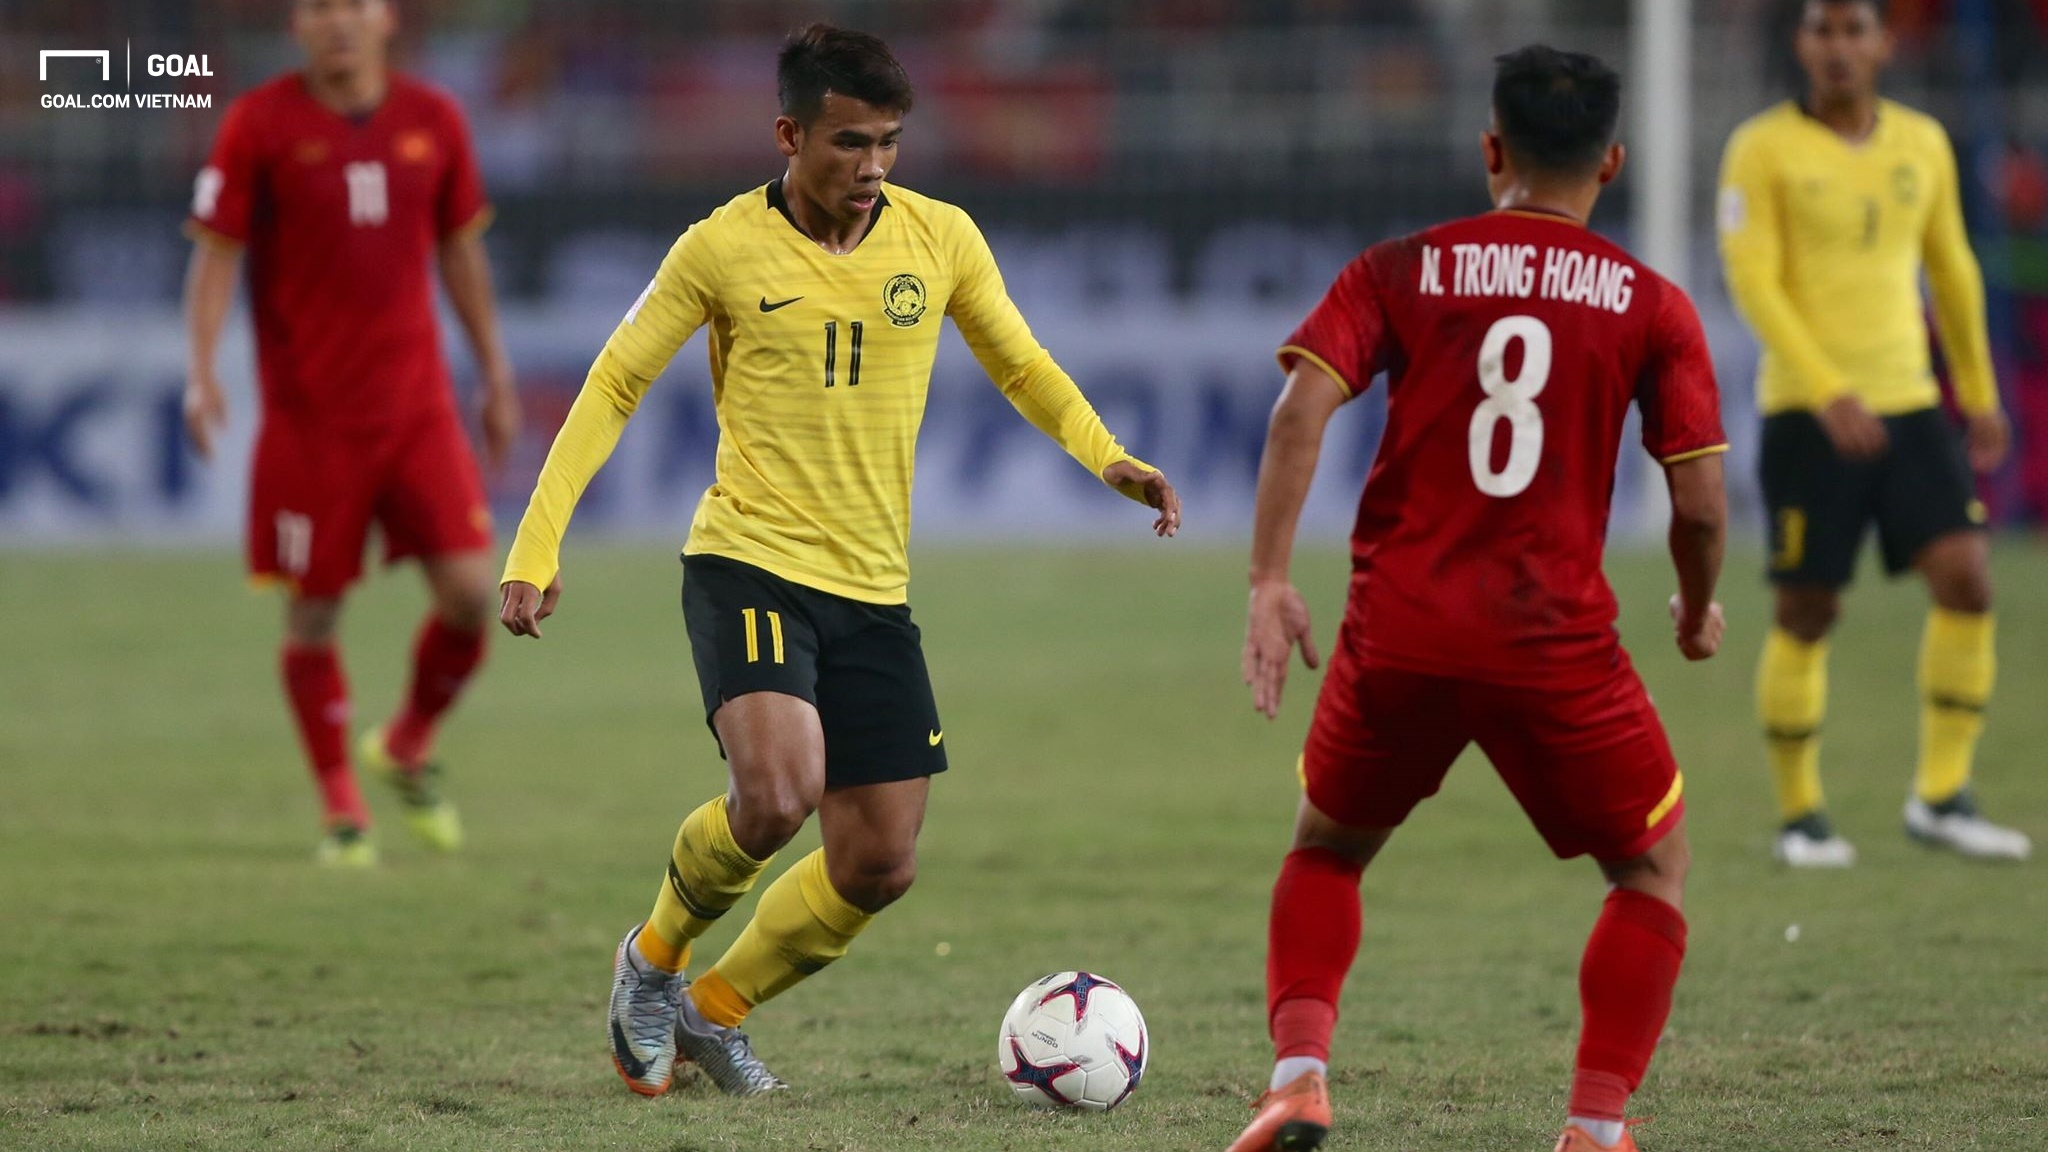 Vietnam Malaysia AFF Suzuki Cup 2018